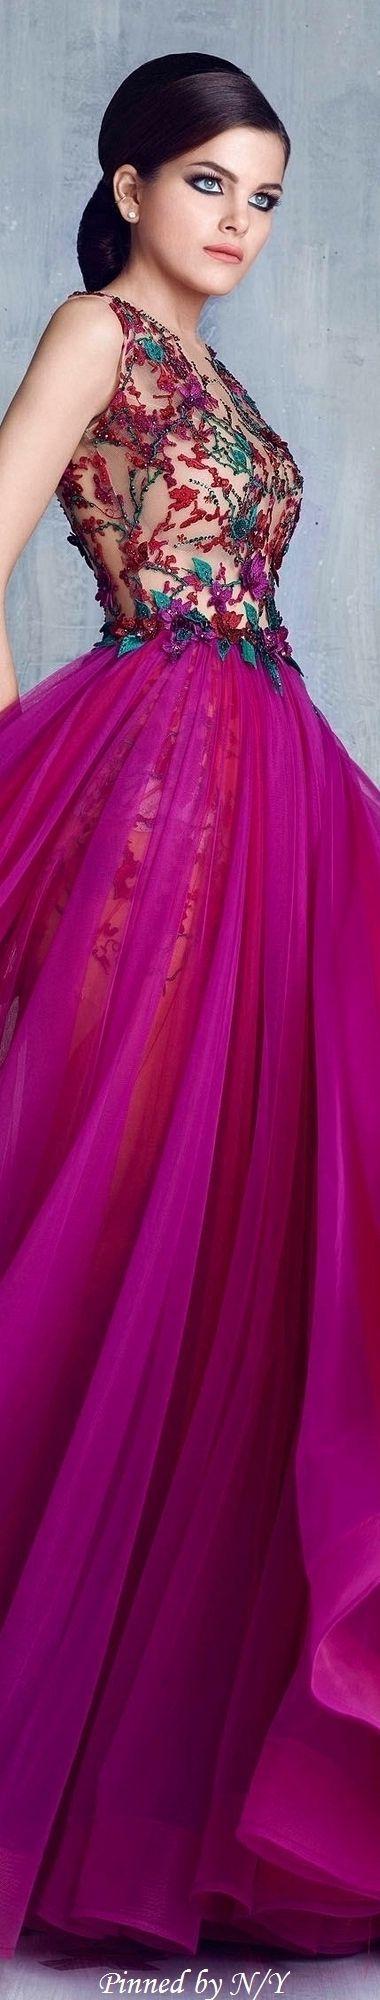 Tony Chaaya Couture S/S 2016 jαɢlαdy